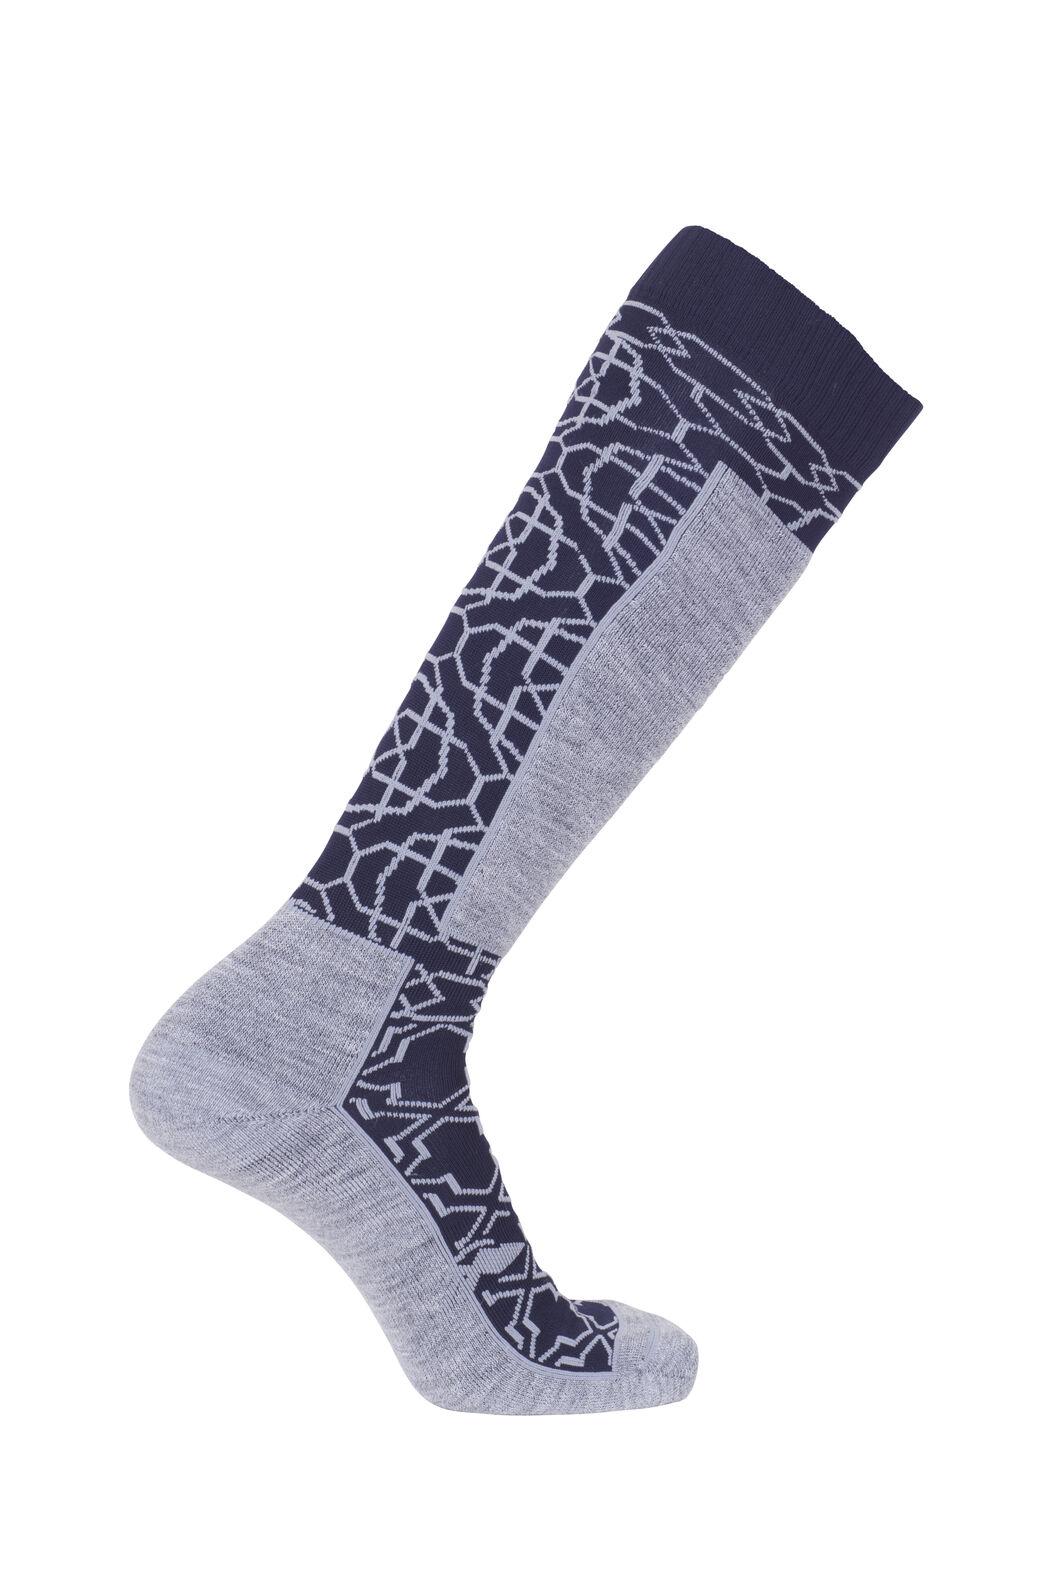 Macpac Tech Ski Socks, Medieval/White, hi-res